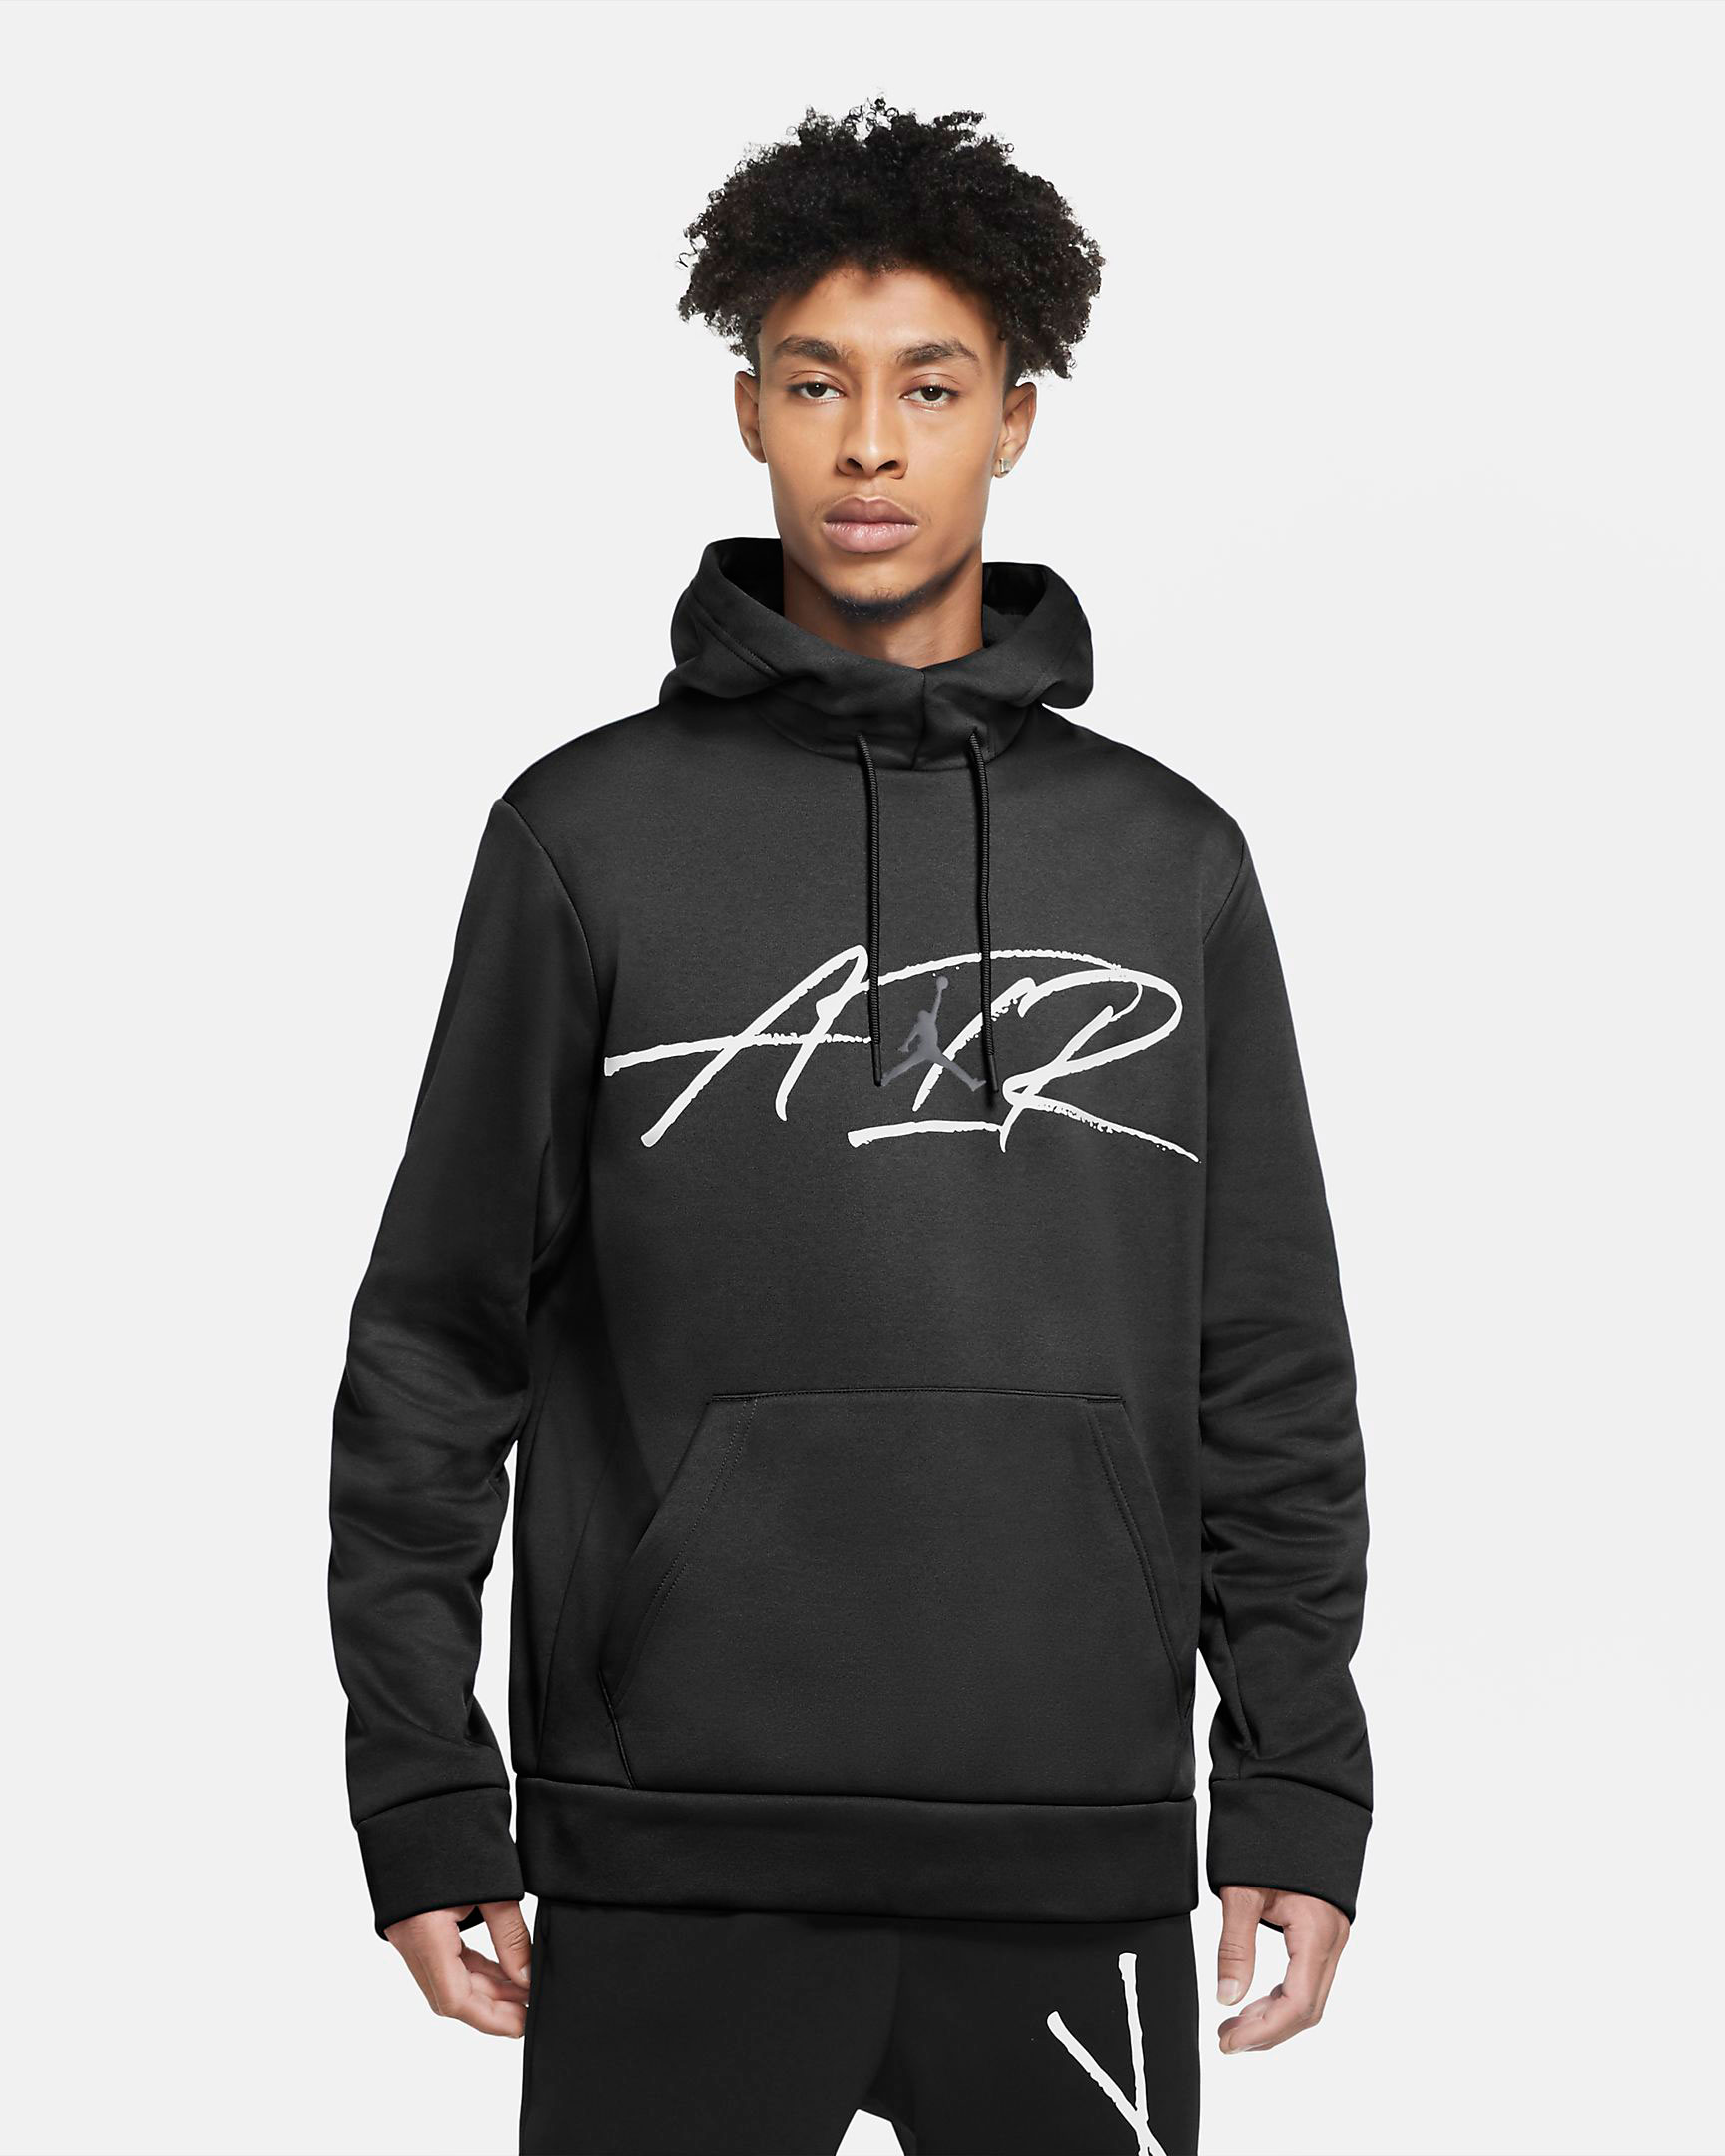 jordan-air-therma-graphic-hoodie-black-grey